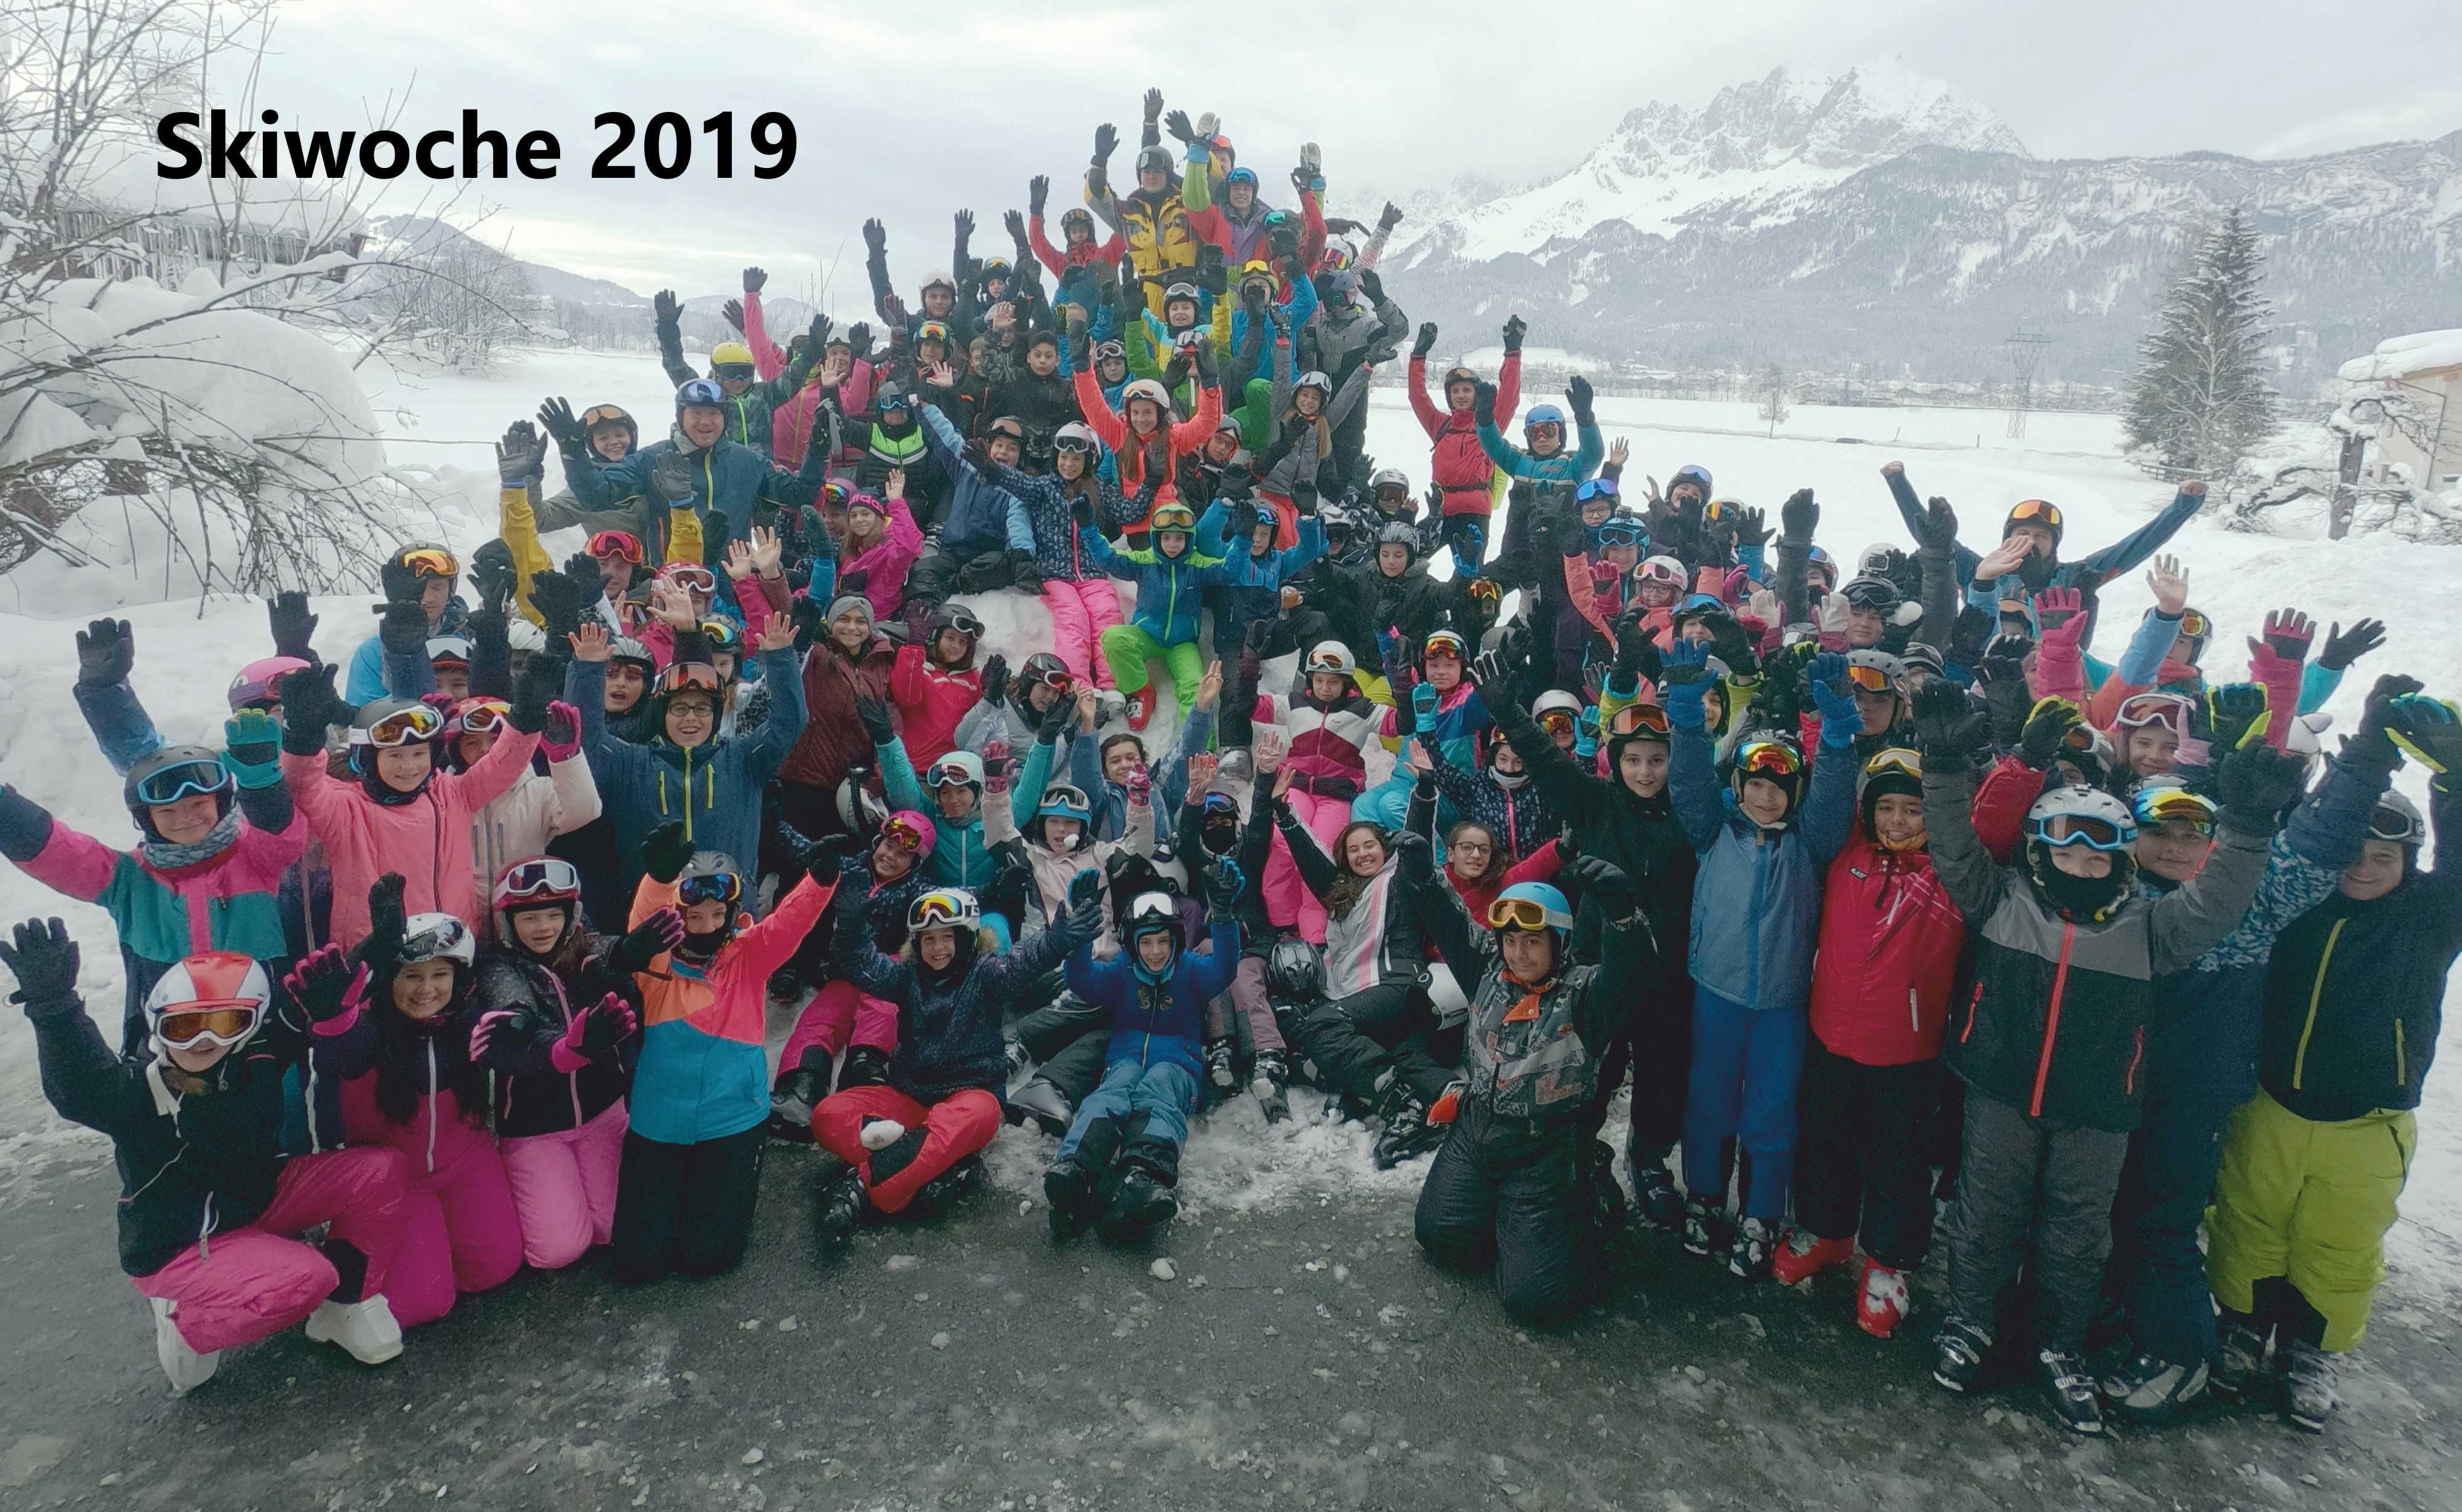 Gruppenphoto Skiwoche 2019.jpg